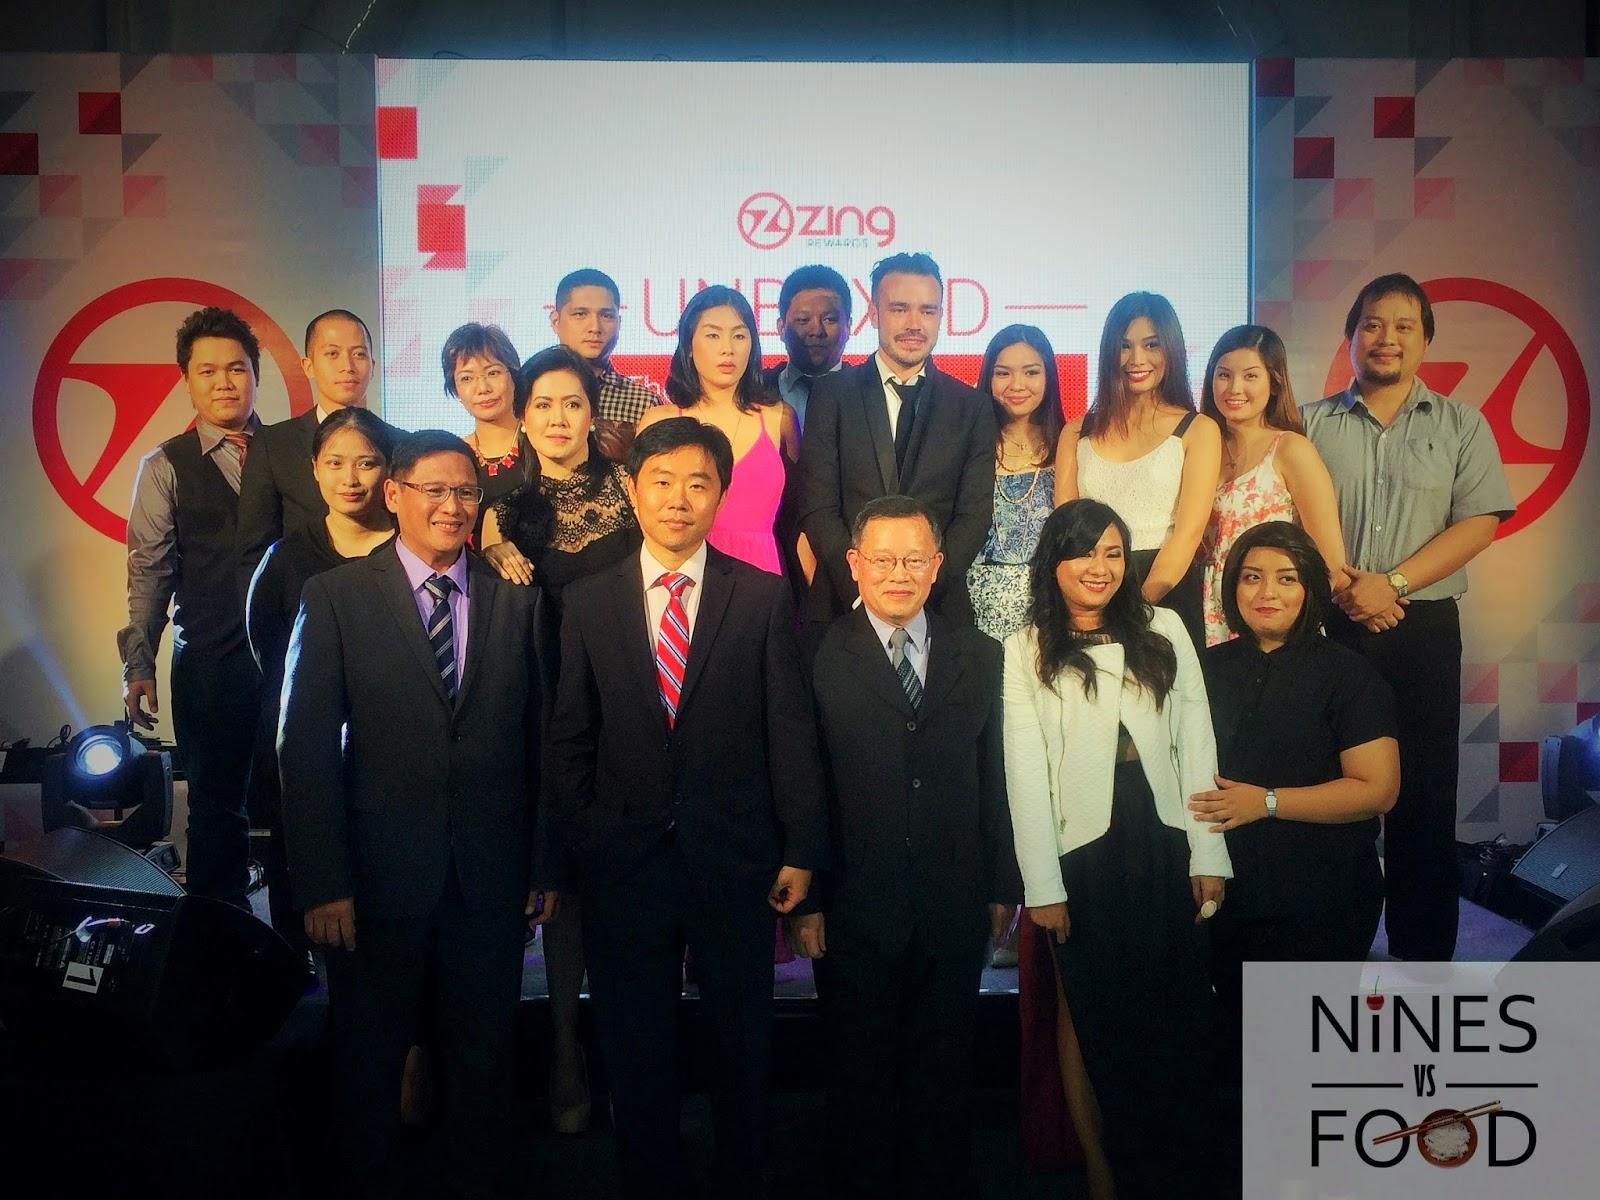 Nines vs. Food - Zing Rewards Philippines-14.jpg